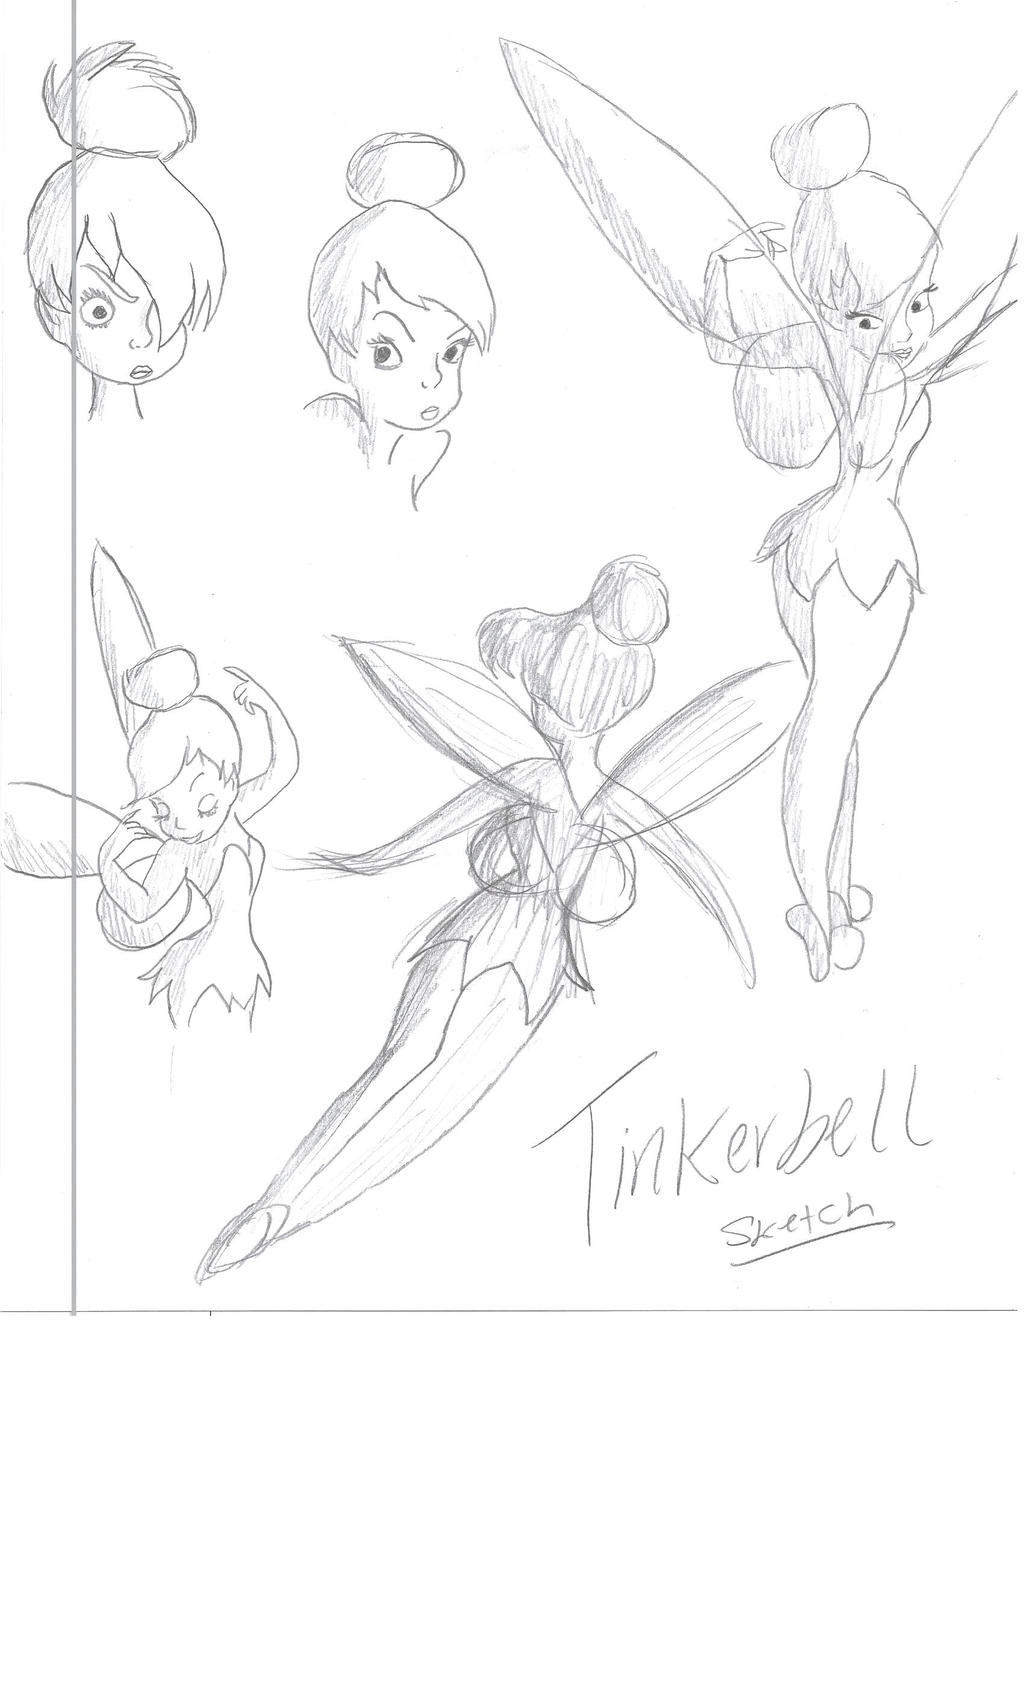 Uncategorized Tinkerbell Sketch Drawing tinkerbell sketch drawing 2 by julietcapulet432 on deviantart julietcapulet432